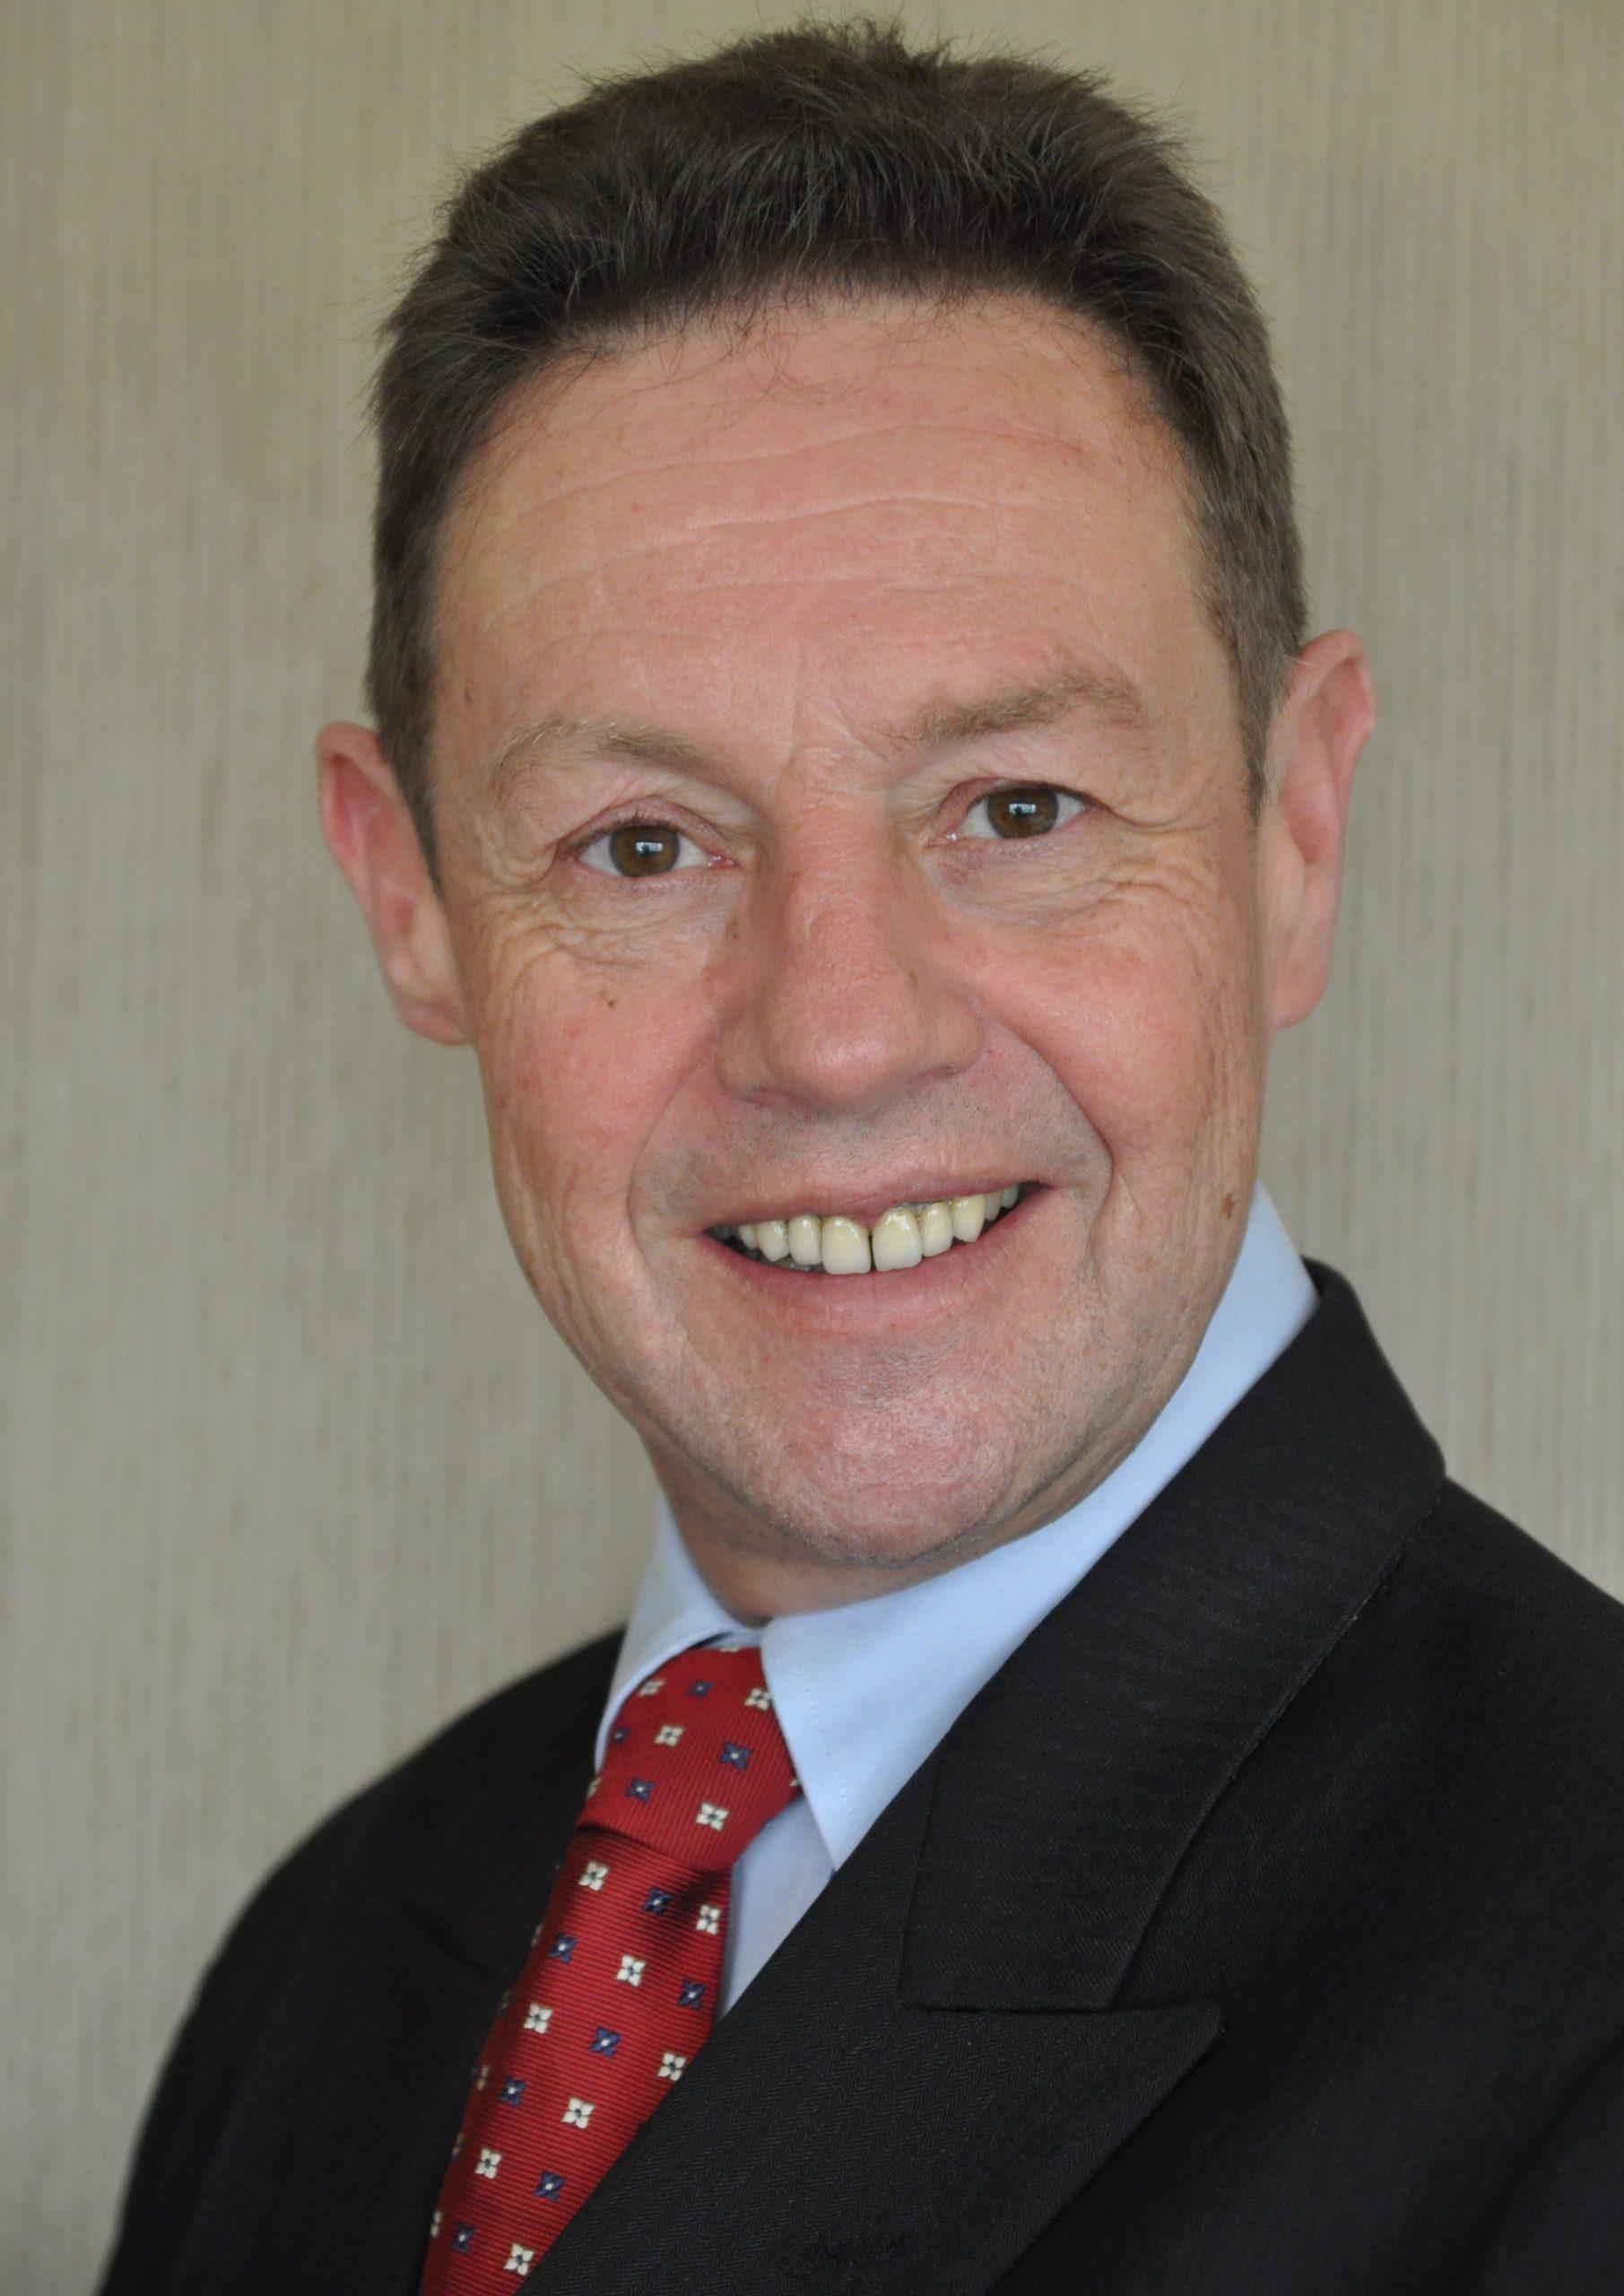 Dr Ian C. Woodward